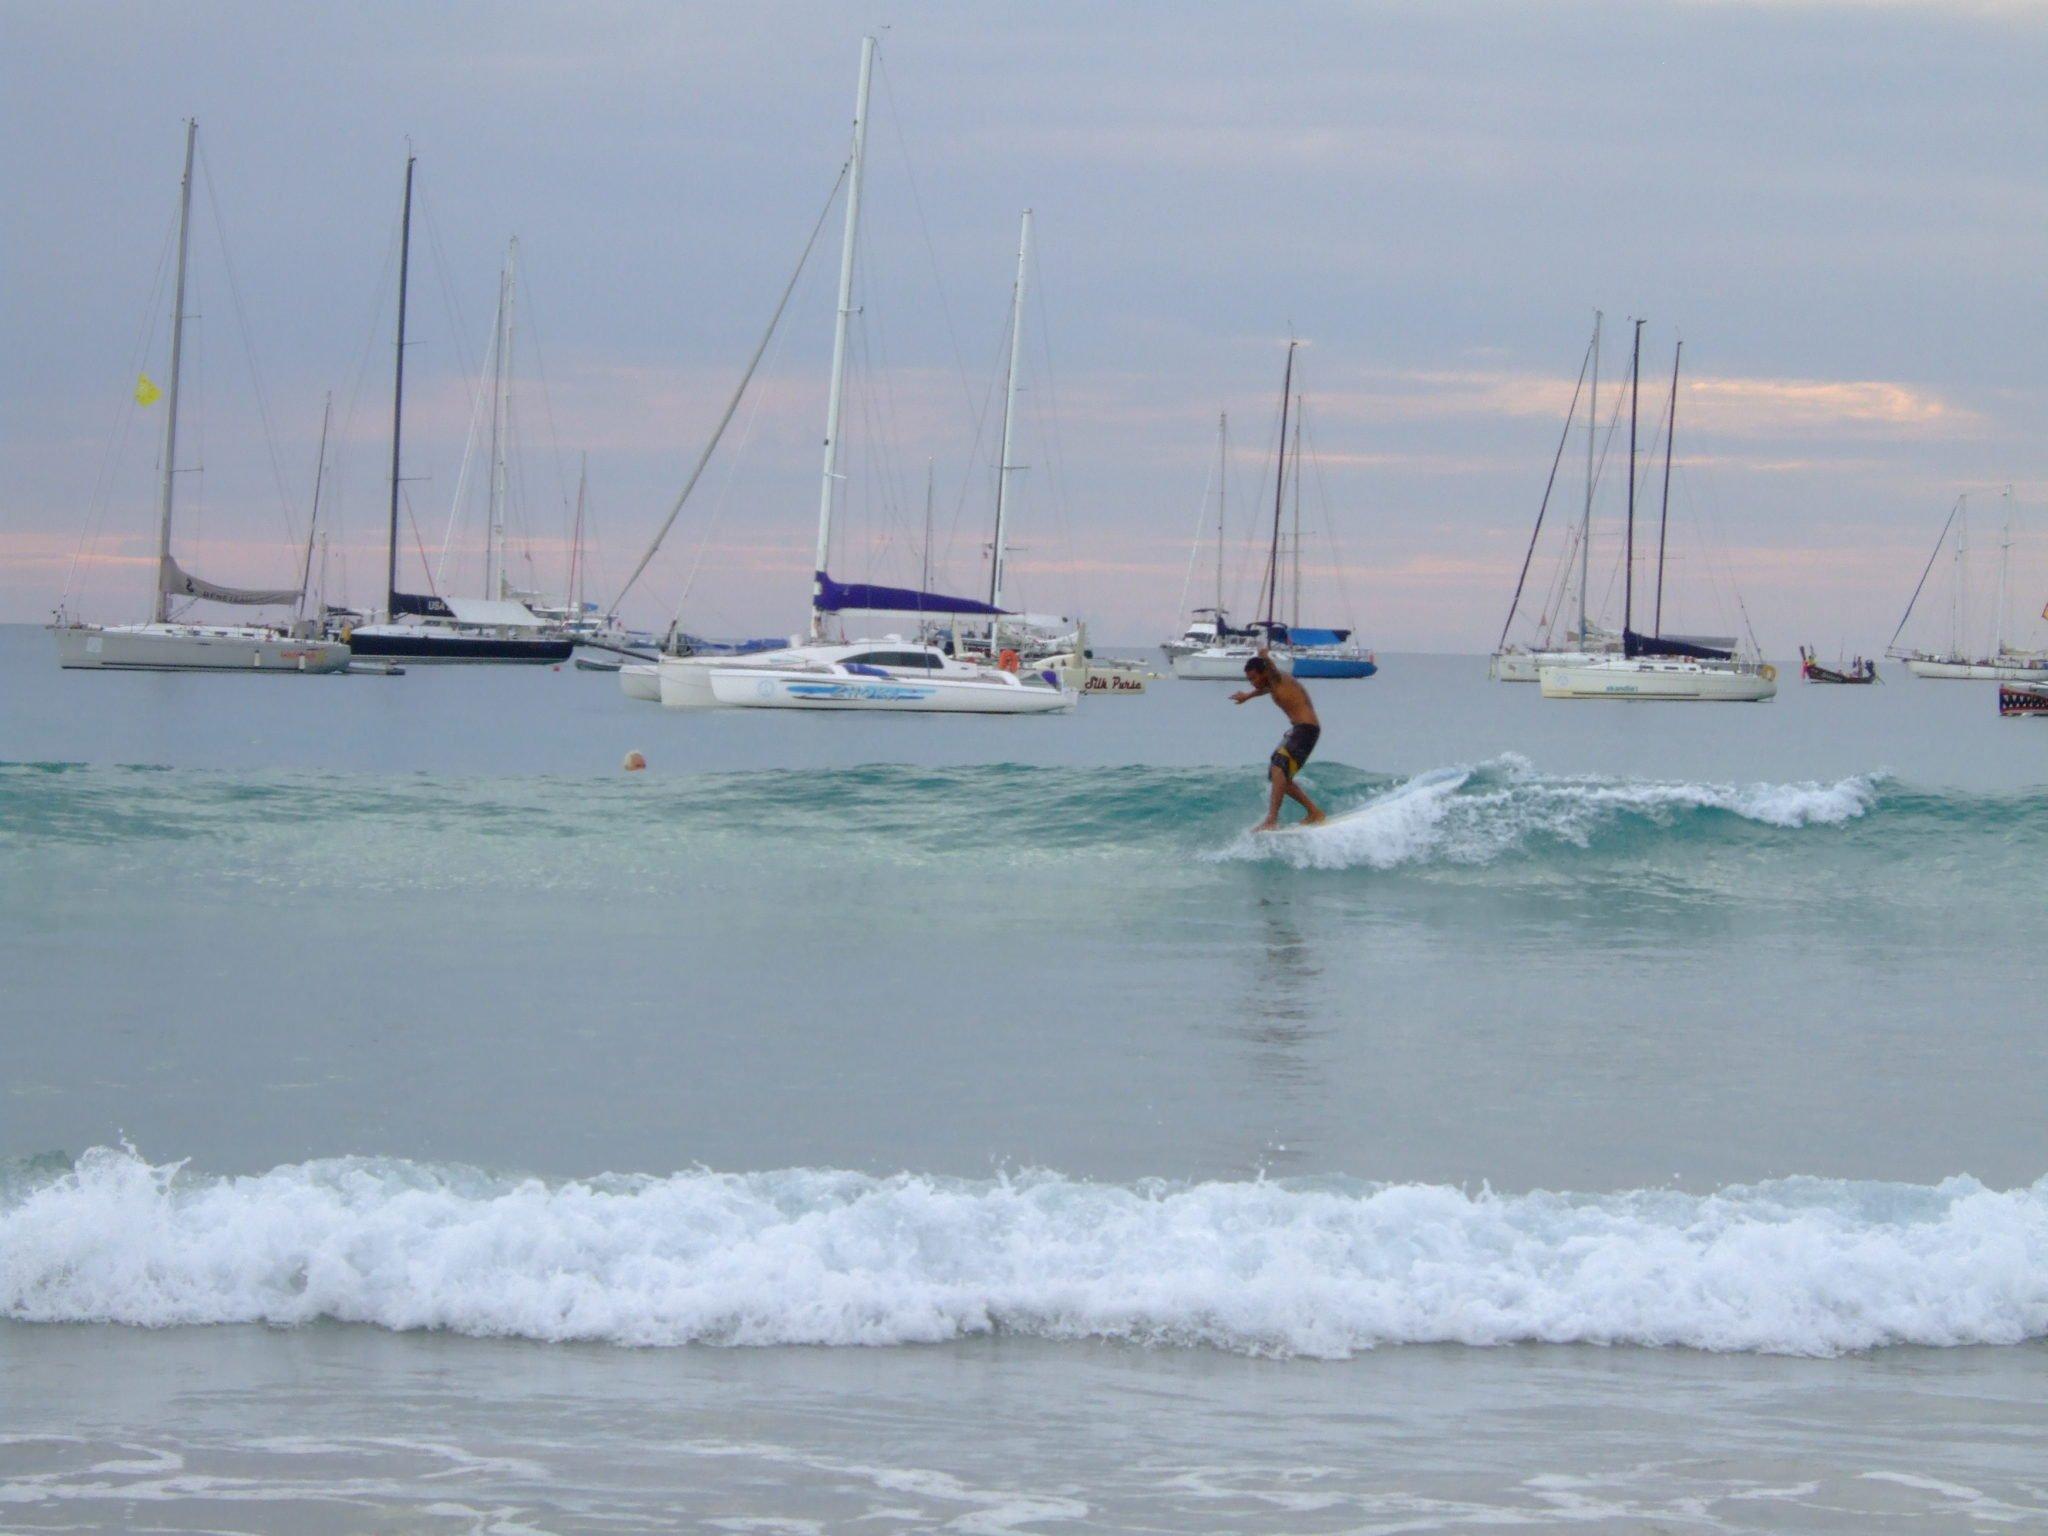 Phuket surfer